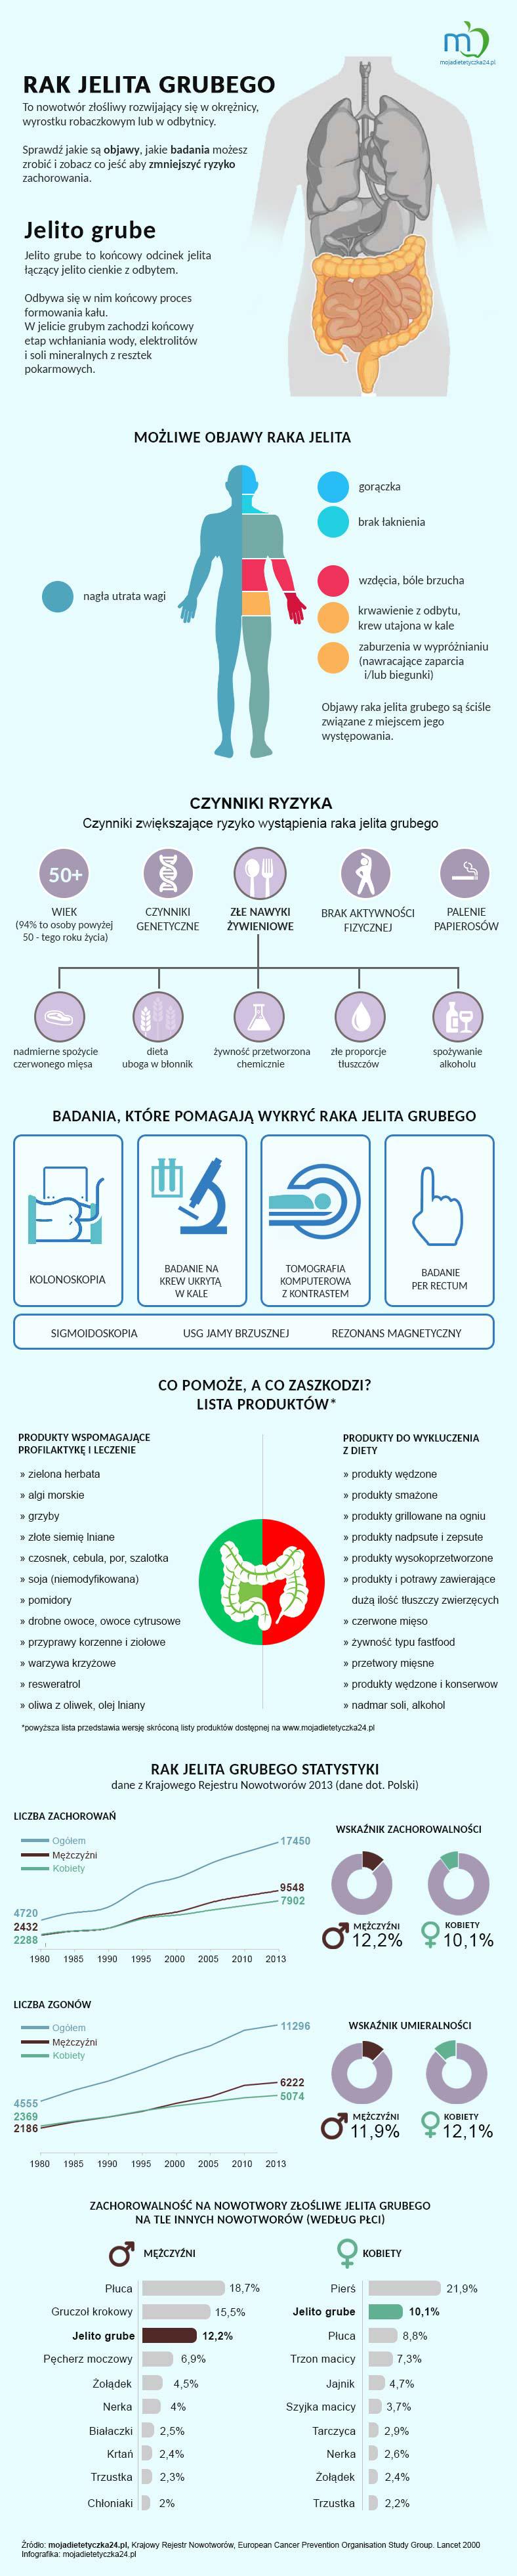 rak jelita grubego Infografika